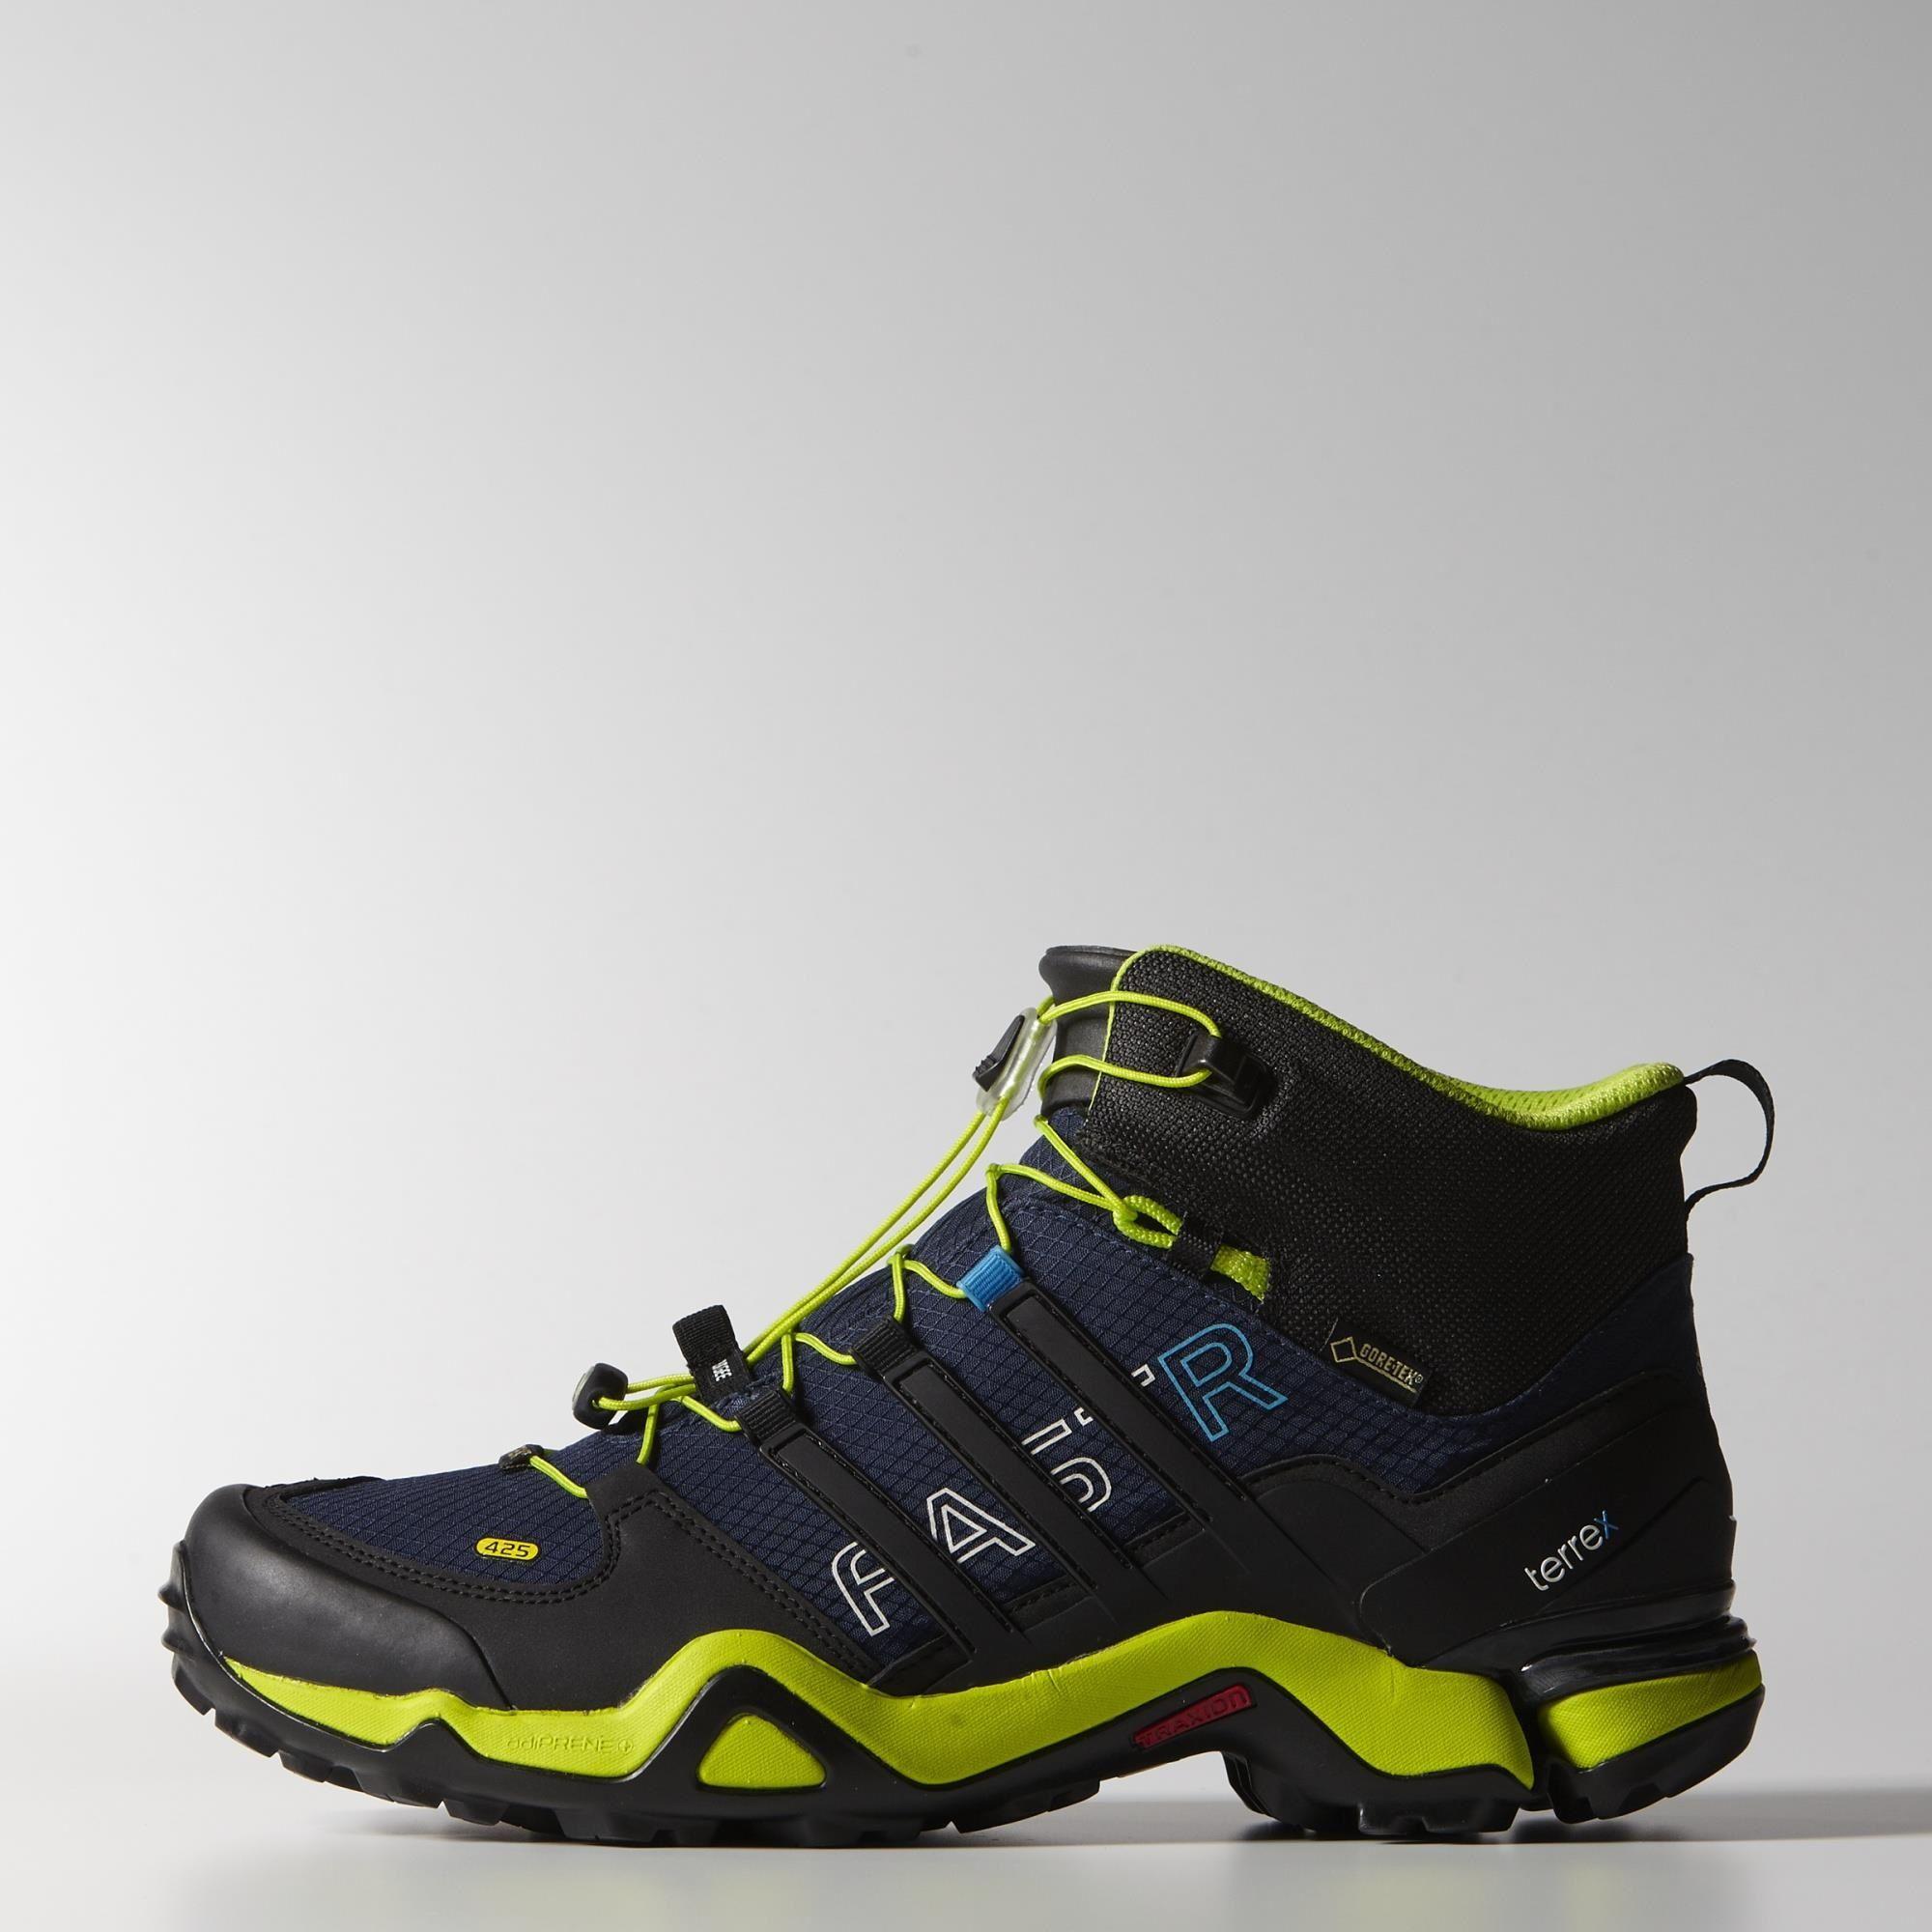 rimborso bibliotecario Serafino  adidasTerrex Fast R Mid GTX | adidas Asia/Middle East | Camping shoes,  Adidas men, Shoes